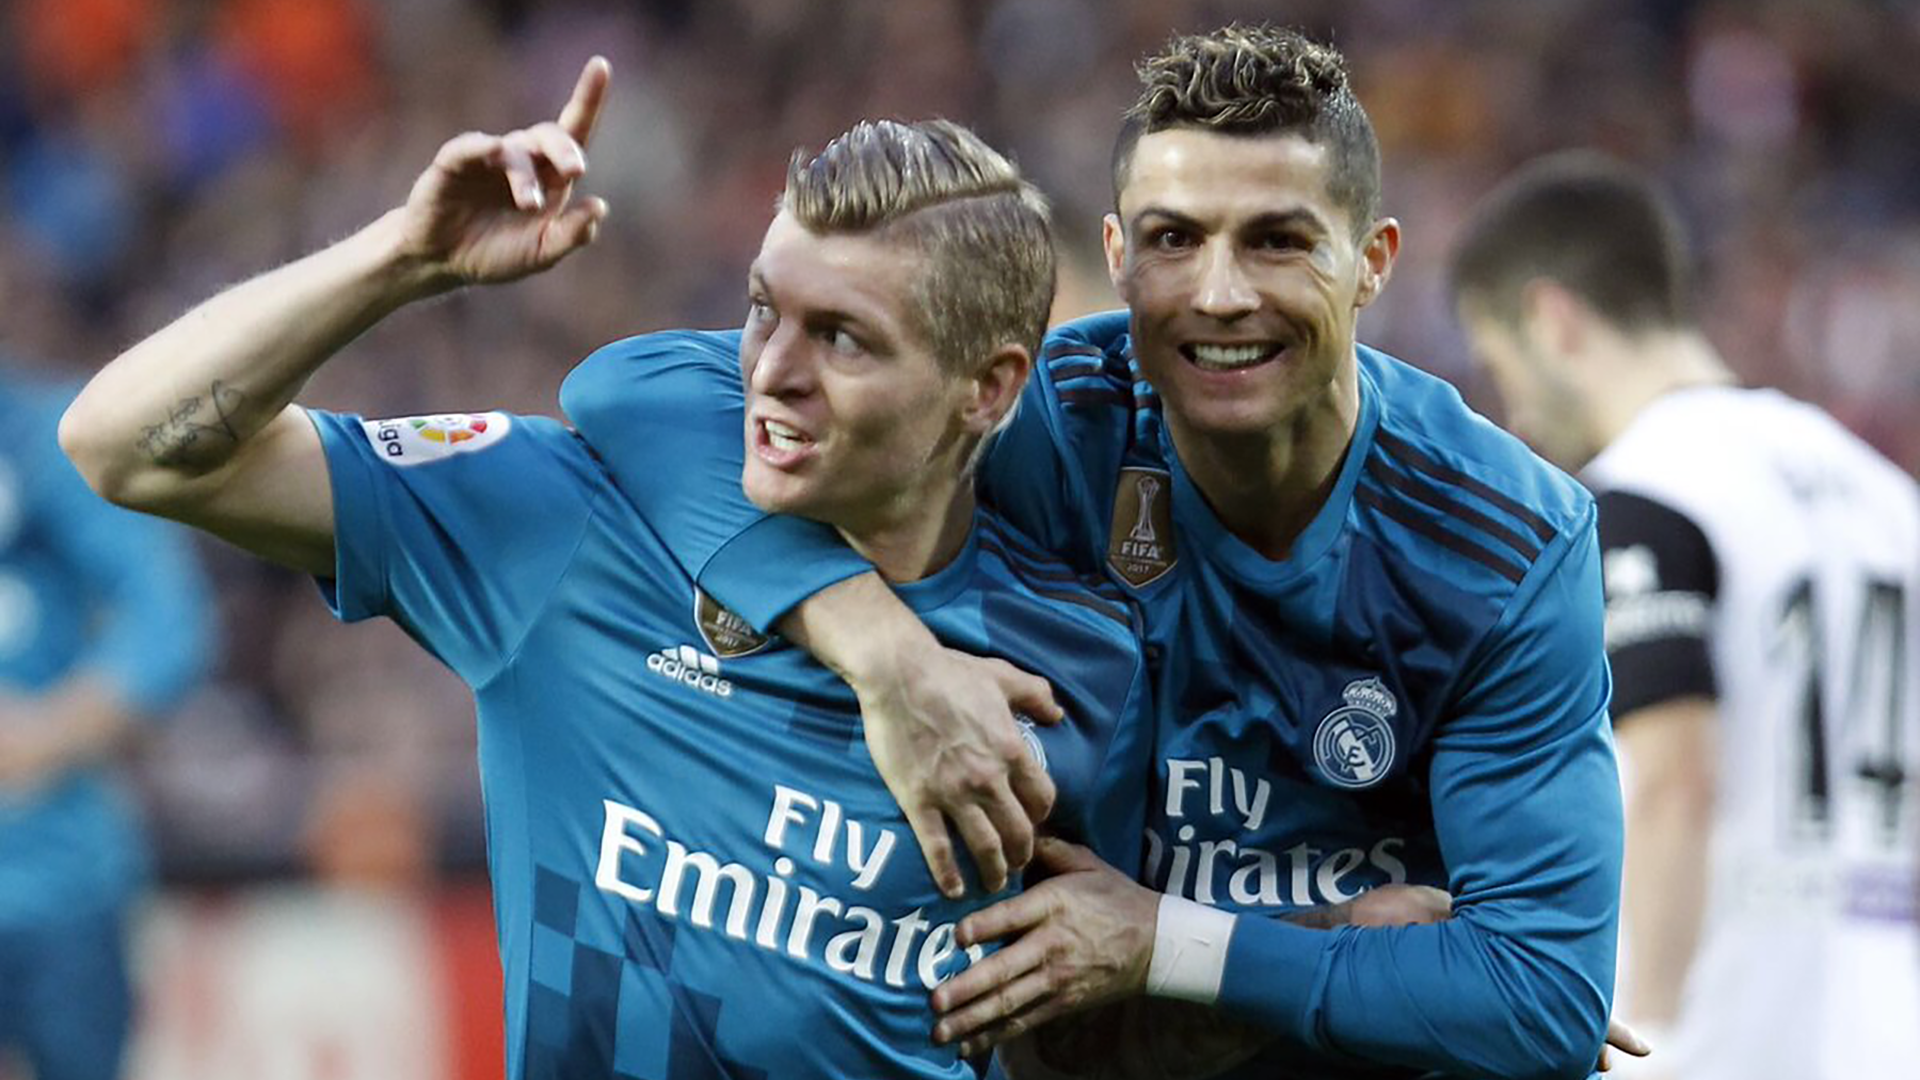 Cristiano Ronaldo's son joins Instagram, already has 979,000 followers